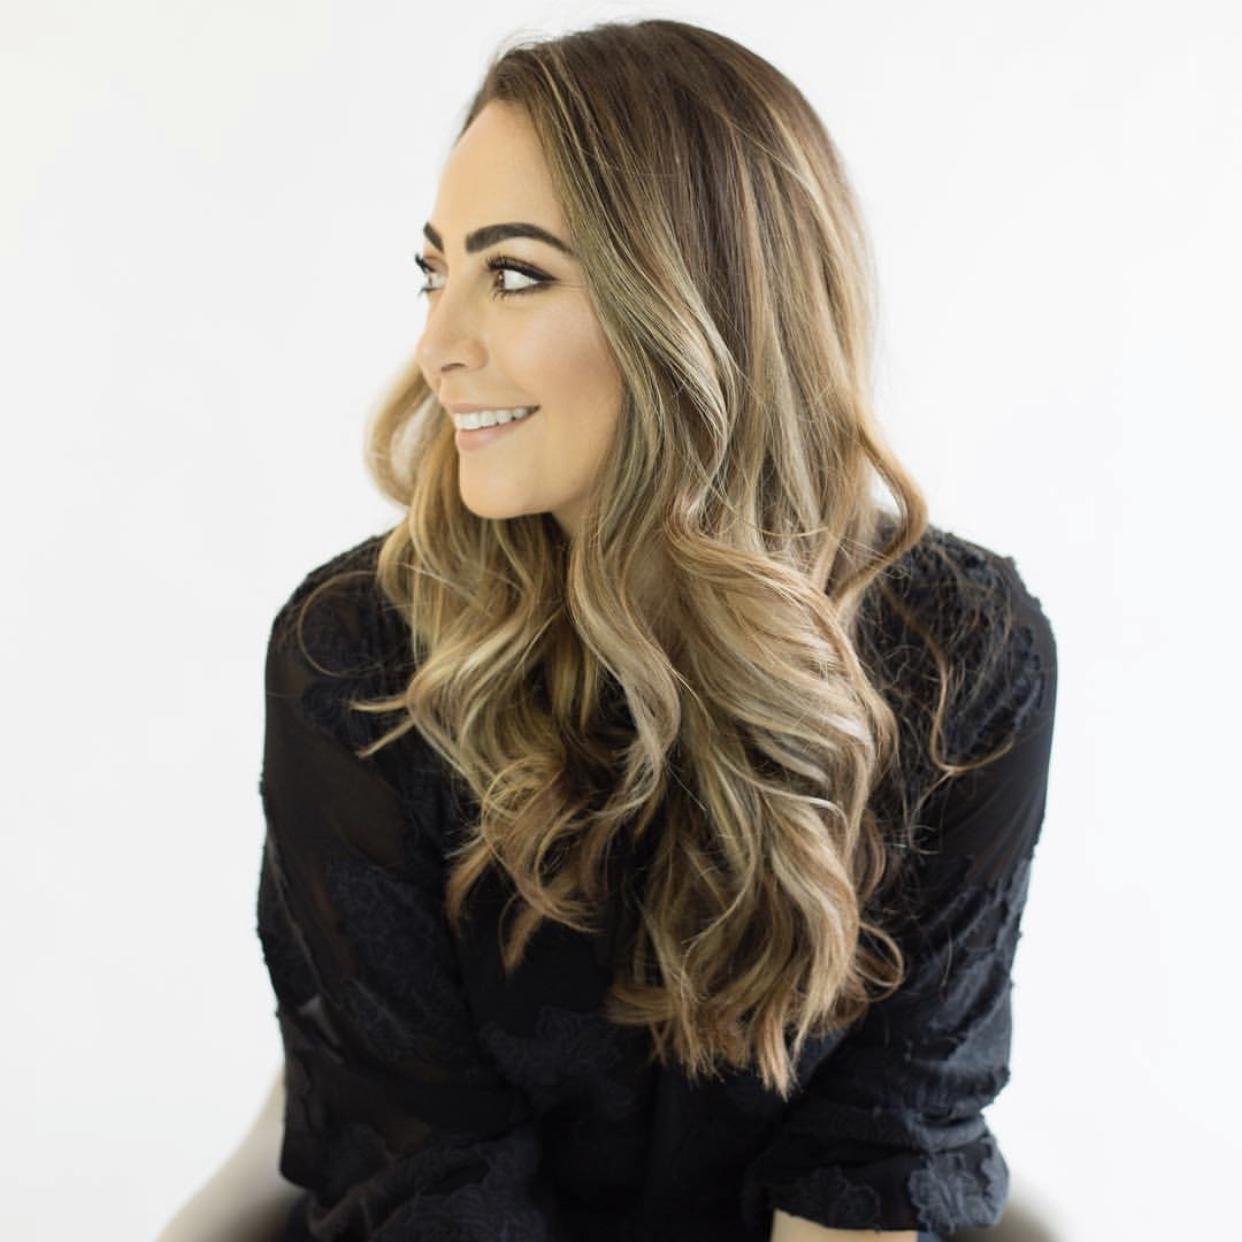 Giovanna Minenna - coach, speaker + entrepreneur